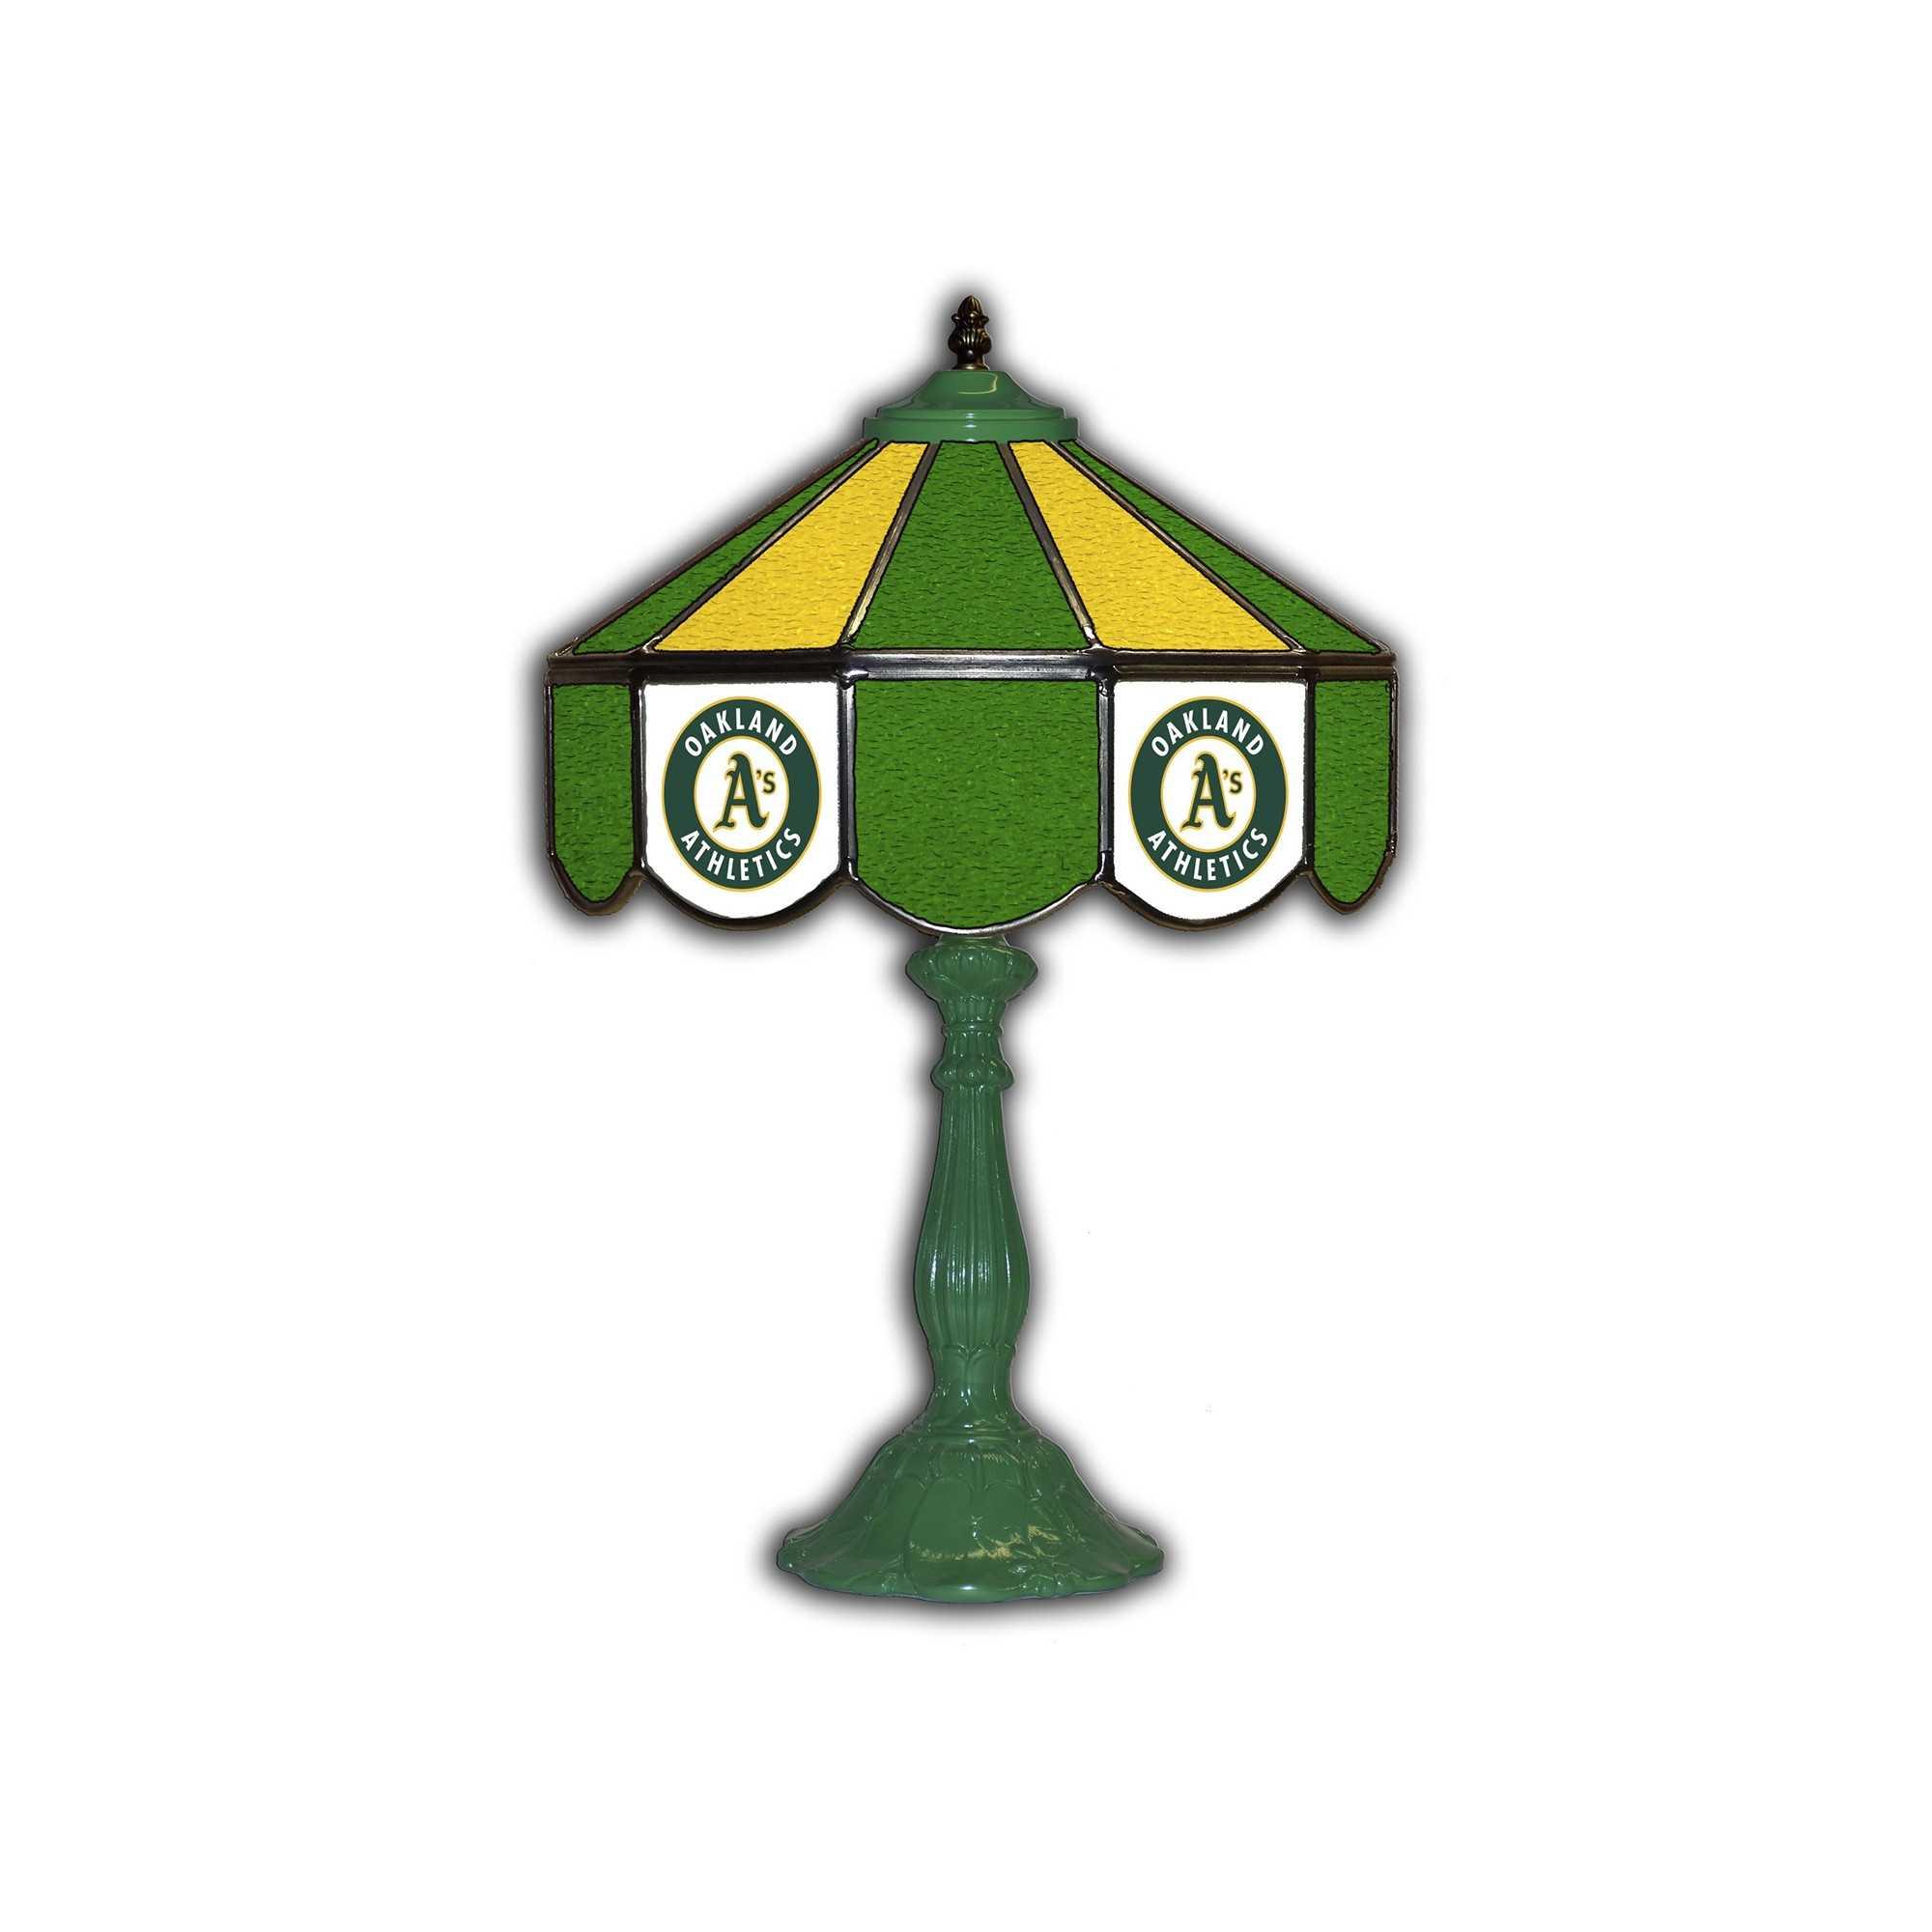 "OAKLAND ATHLETICS 21"" GLASS TABLE LAMP"